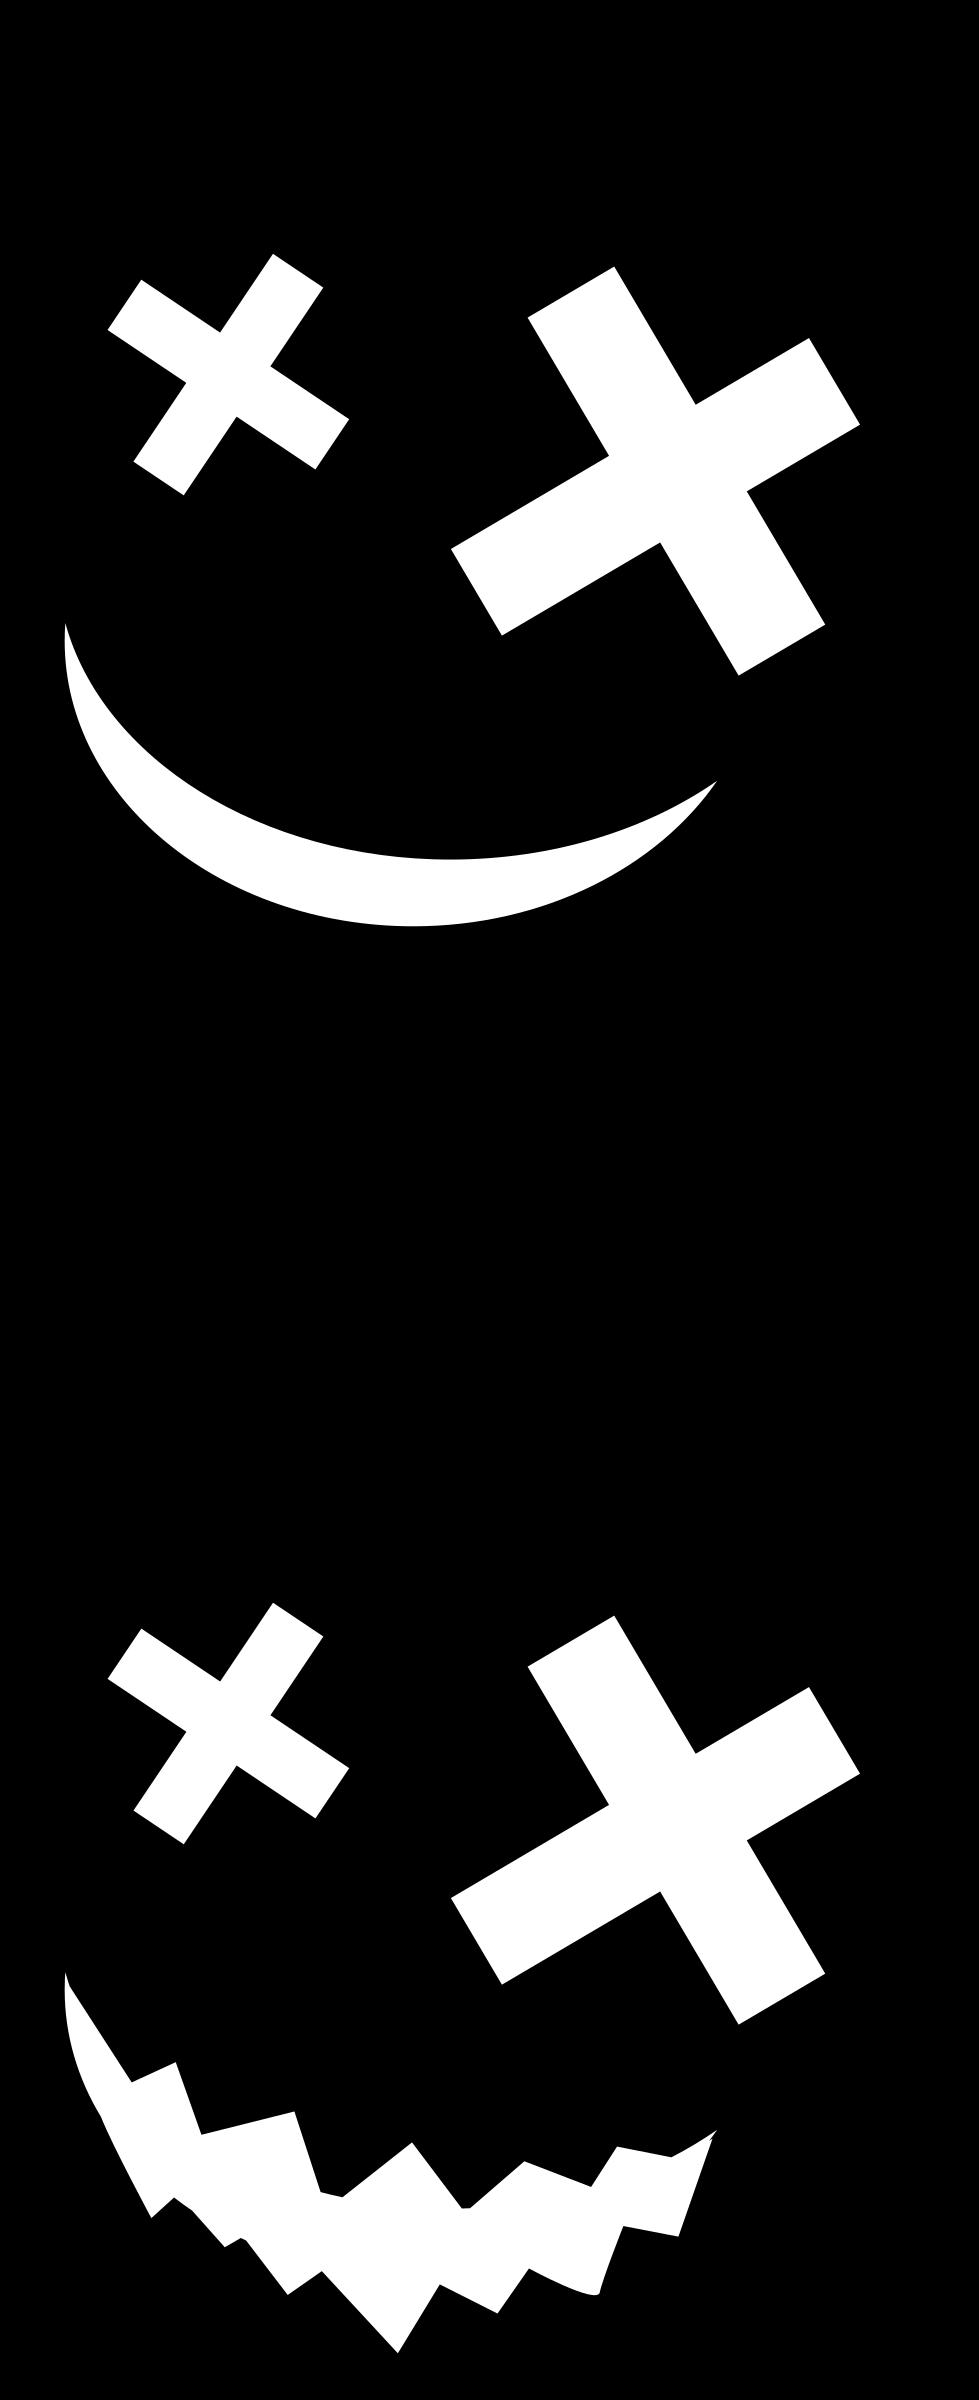 Halloween silhouettes big image. Pumpkin clipart silhouette